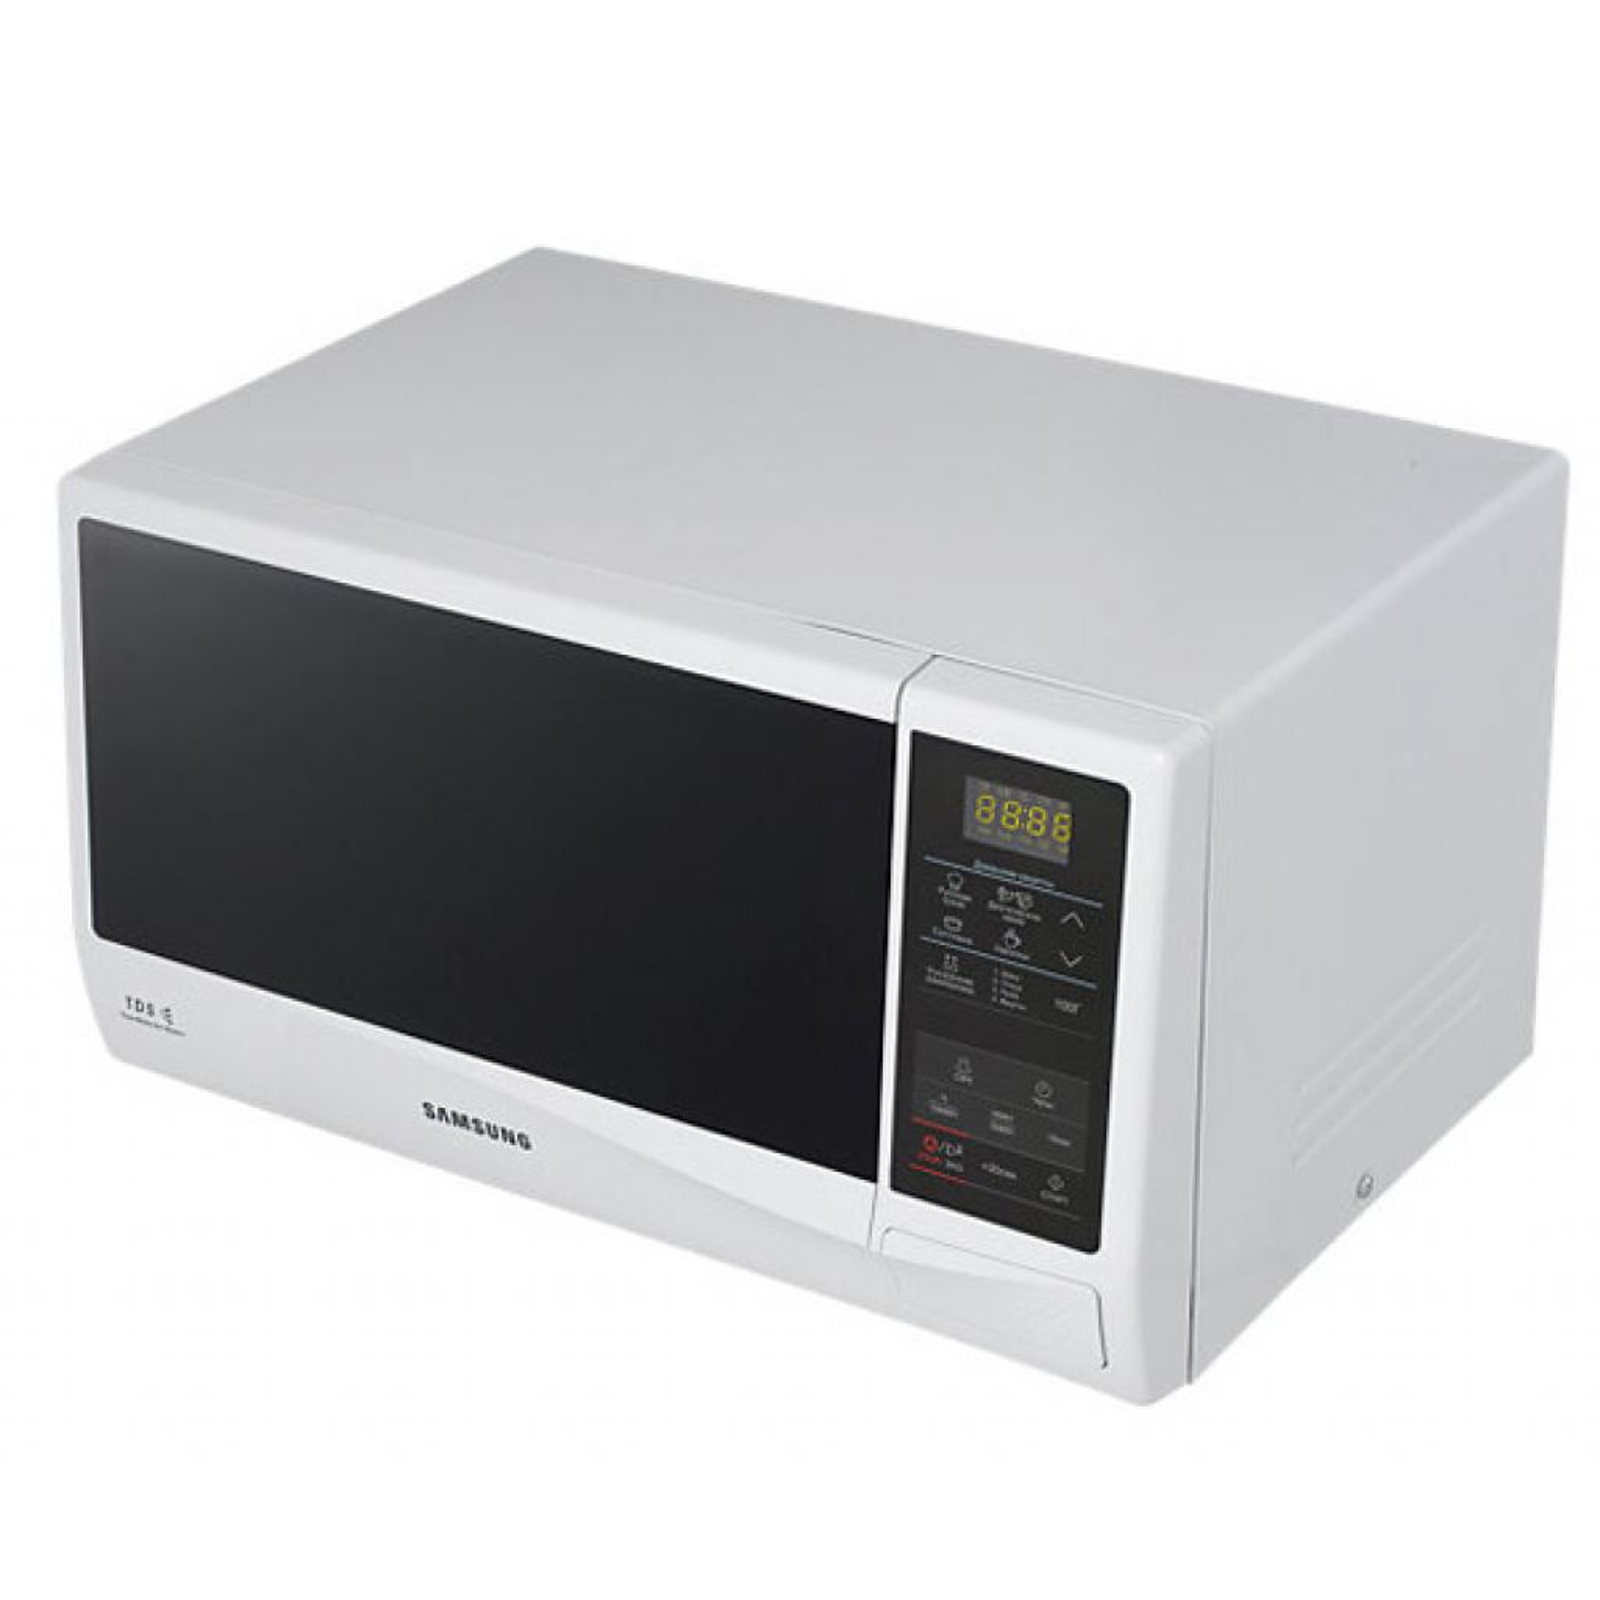 Микроволновая печь Samsung ME 83 KRW-2/BW (ME83KRW-2/BW) изображение 4